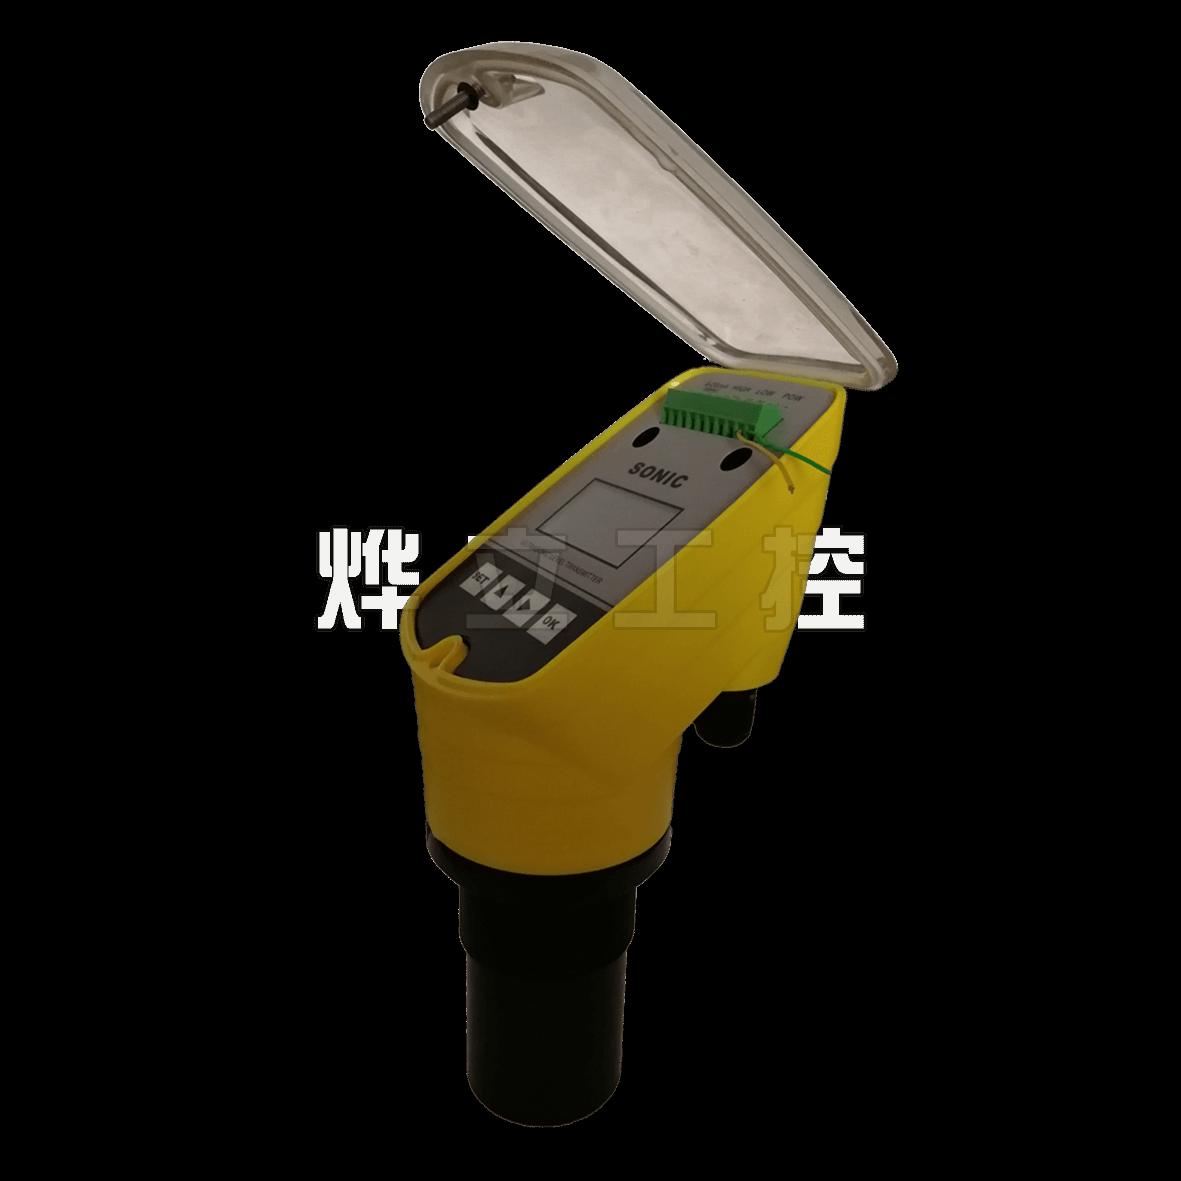 YEH-KJ4X超声波液位计说明书